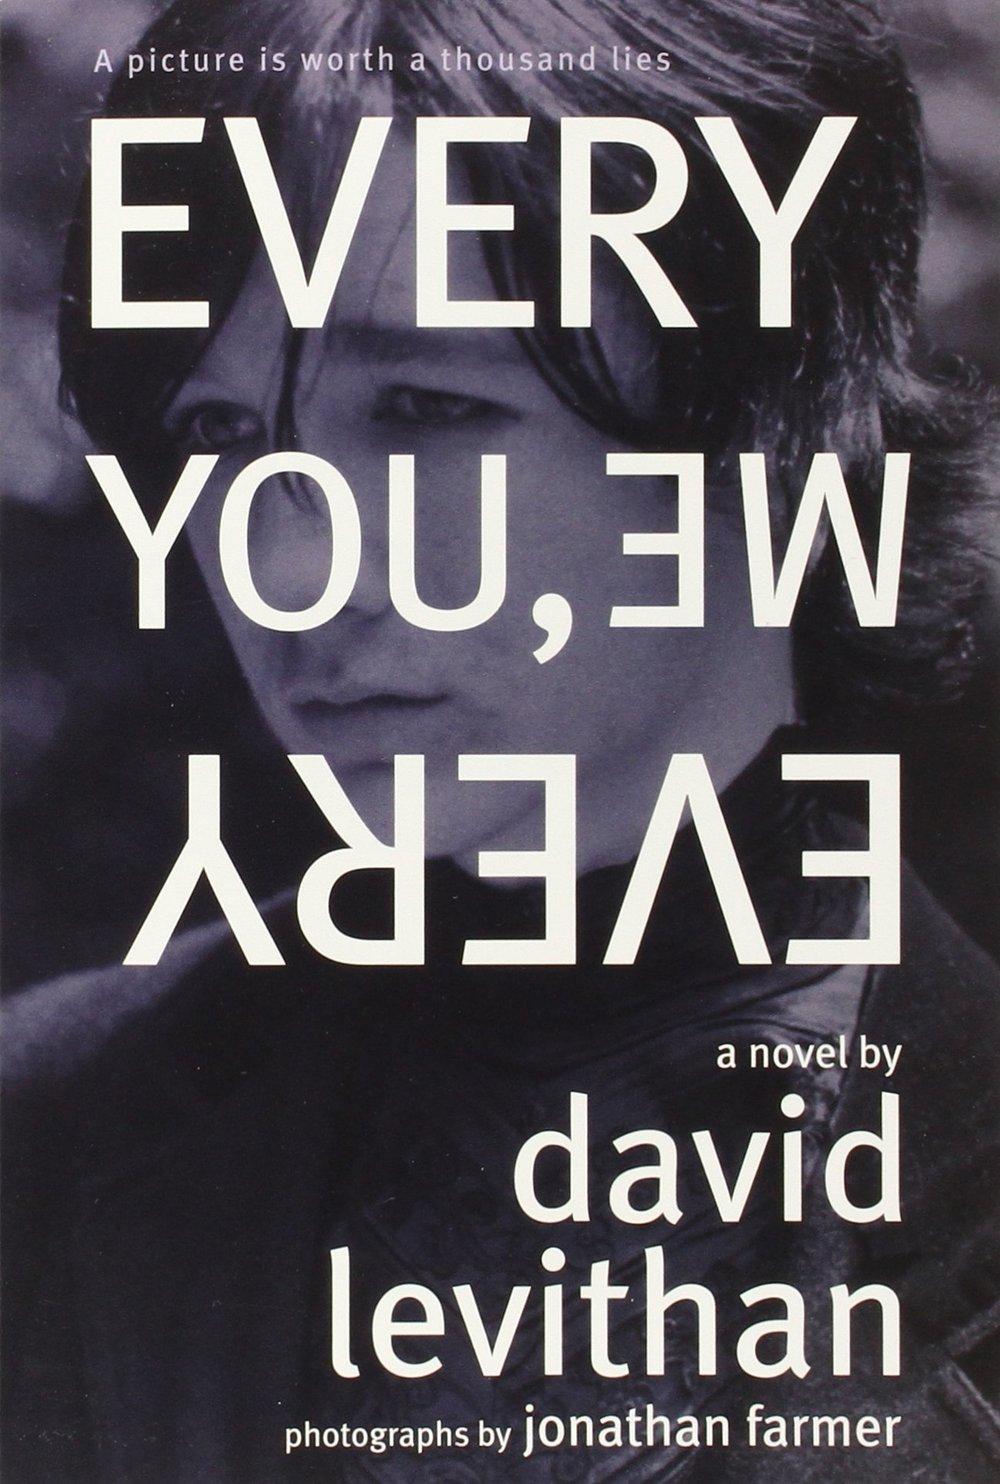 david-levithan-every-you-every-me.jpg